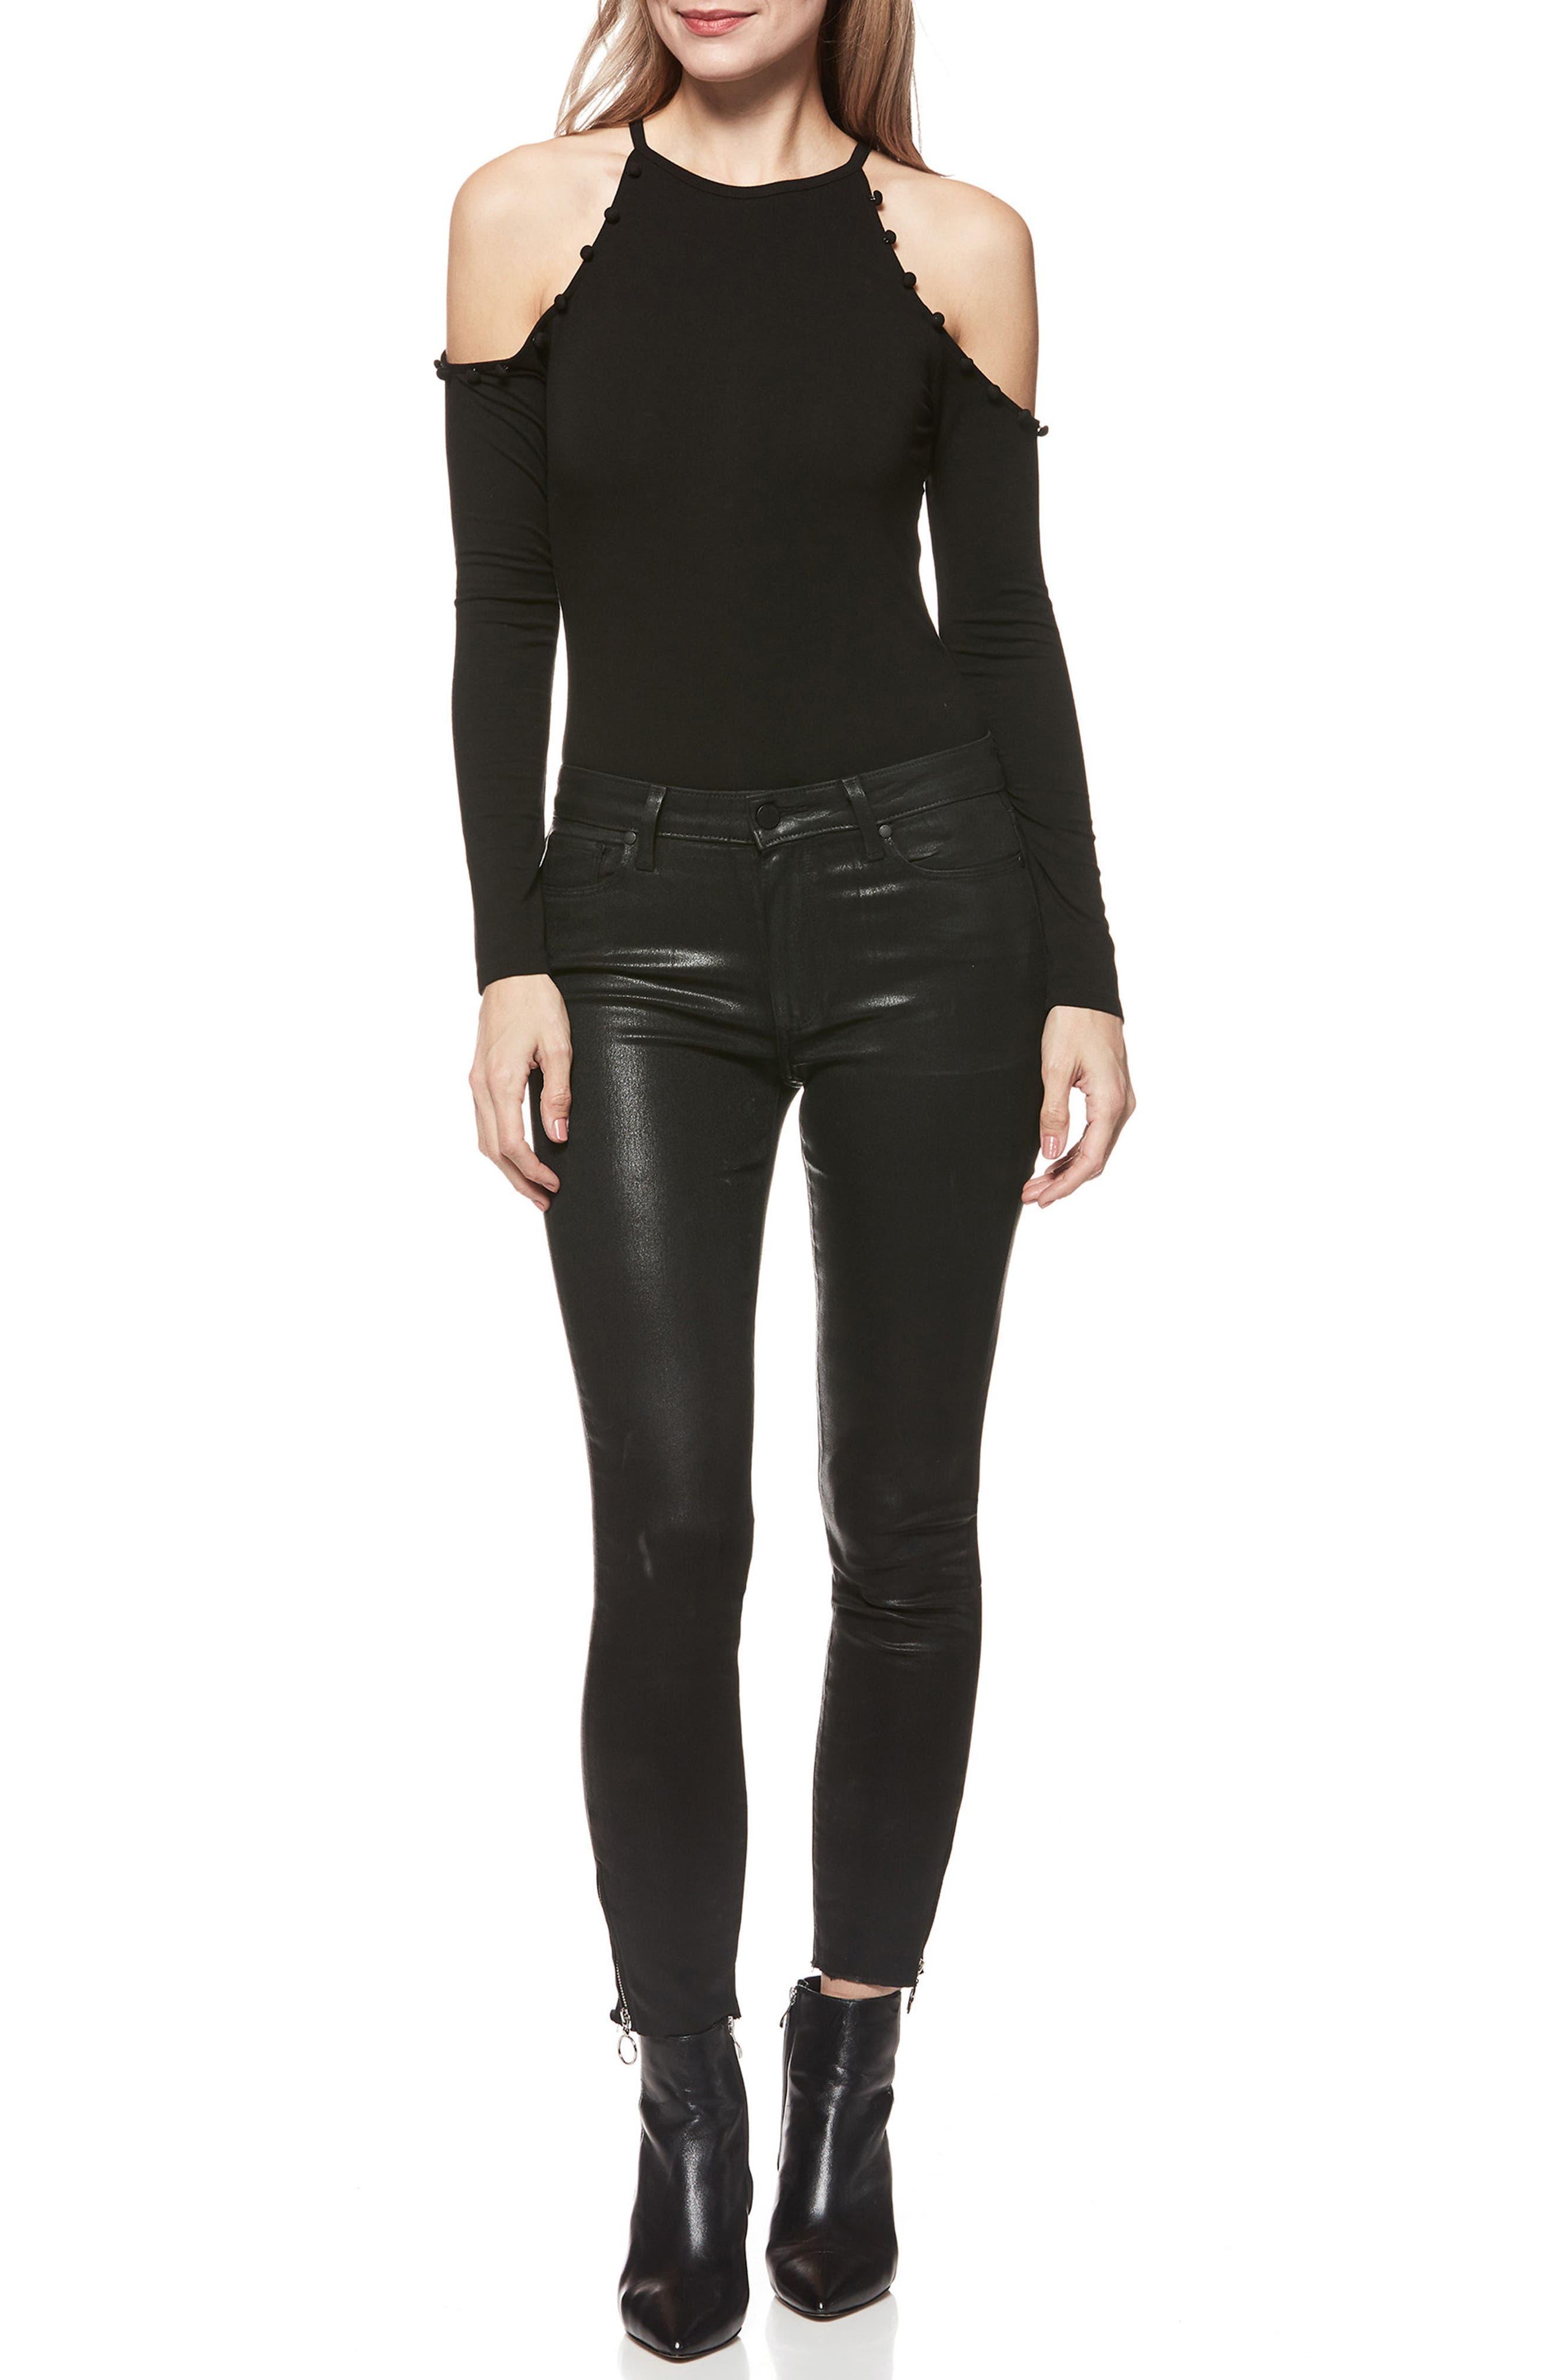 Siana Cold-Shoulder Bodysuit,                             Alternate thumbnail 3, color,                             001